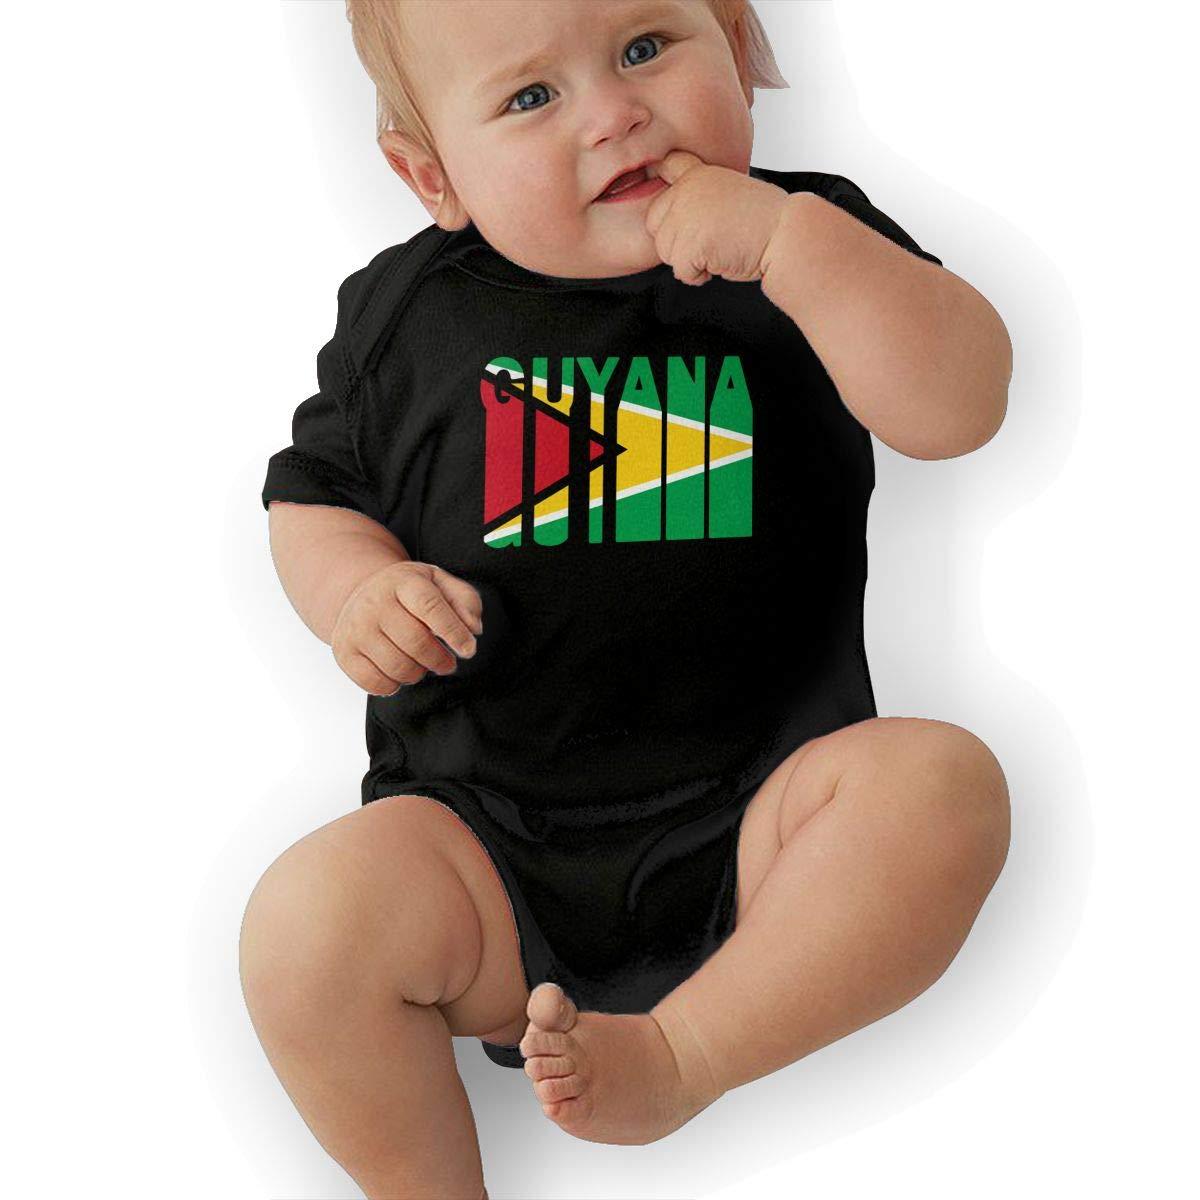 Mri-le2 Toddler Baby Boy Girl Short Sleeve Organic Bodysuits Retro Guyana Flag Infant Romper Jumpsuit